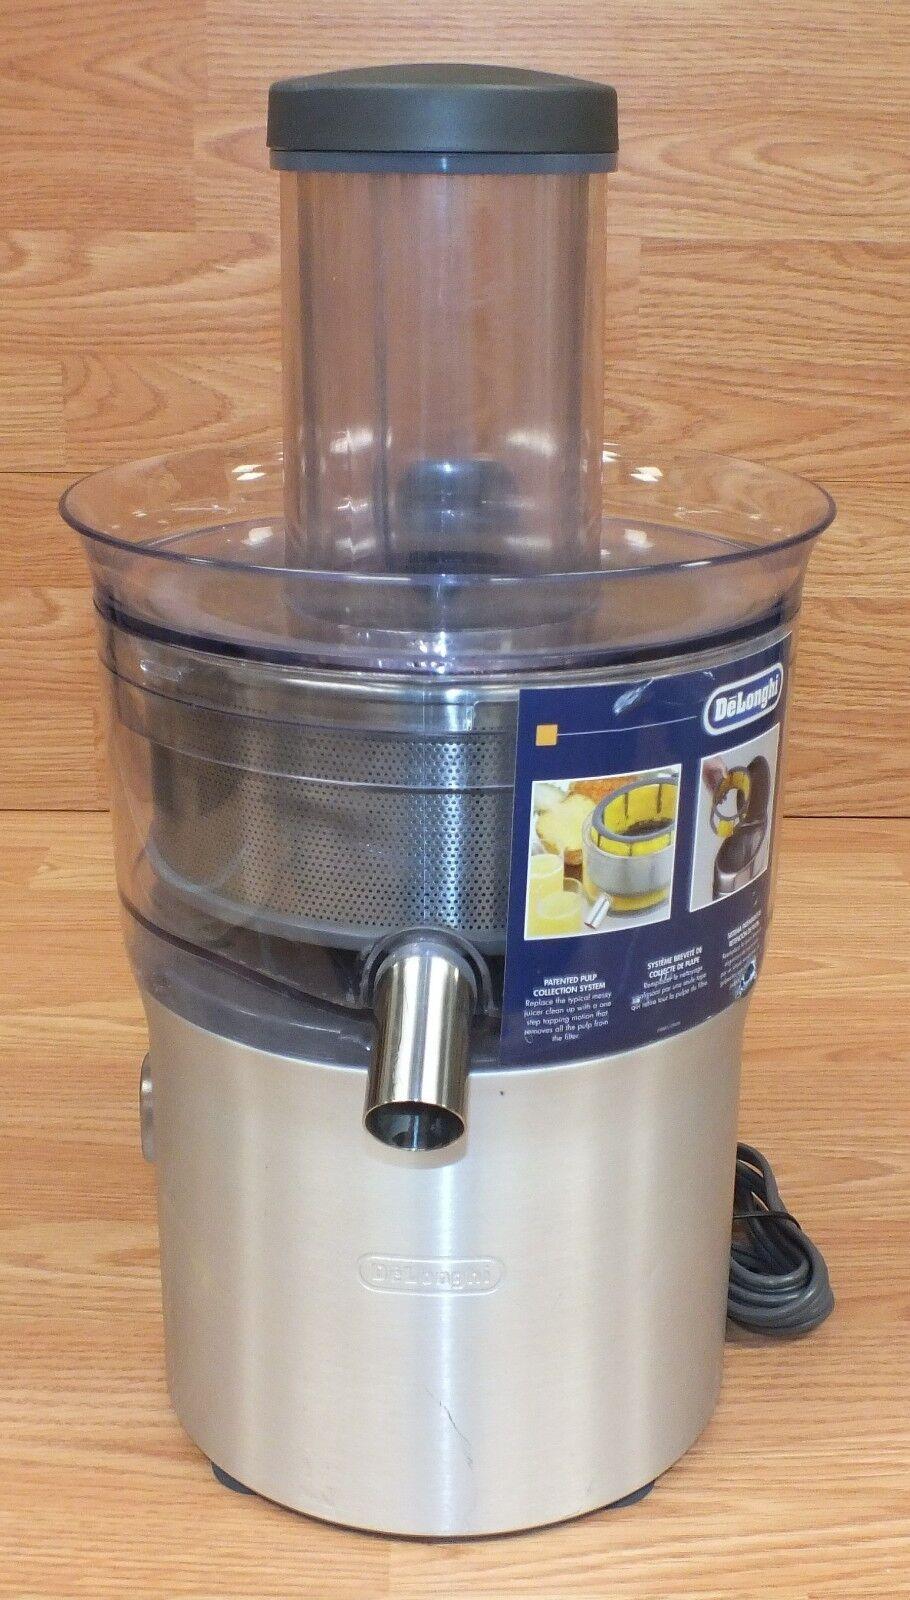 Genuine Delonghi (DJE950) Electric Stainless Steel Induction Juice Extractor